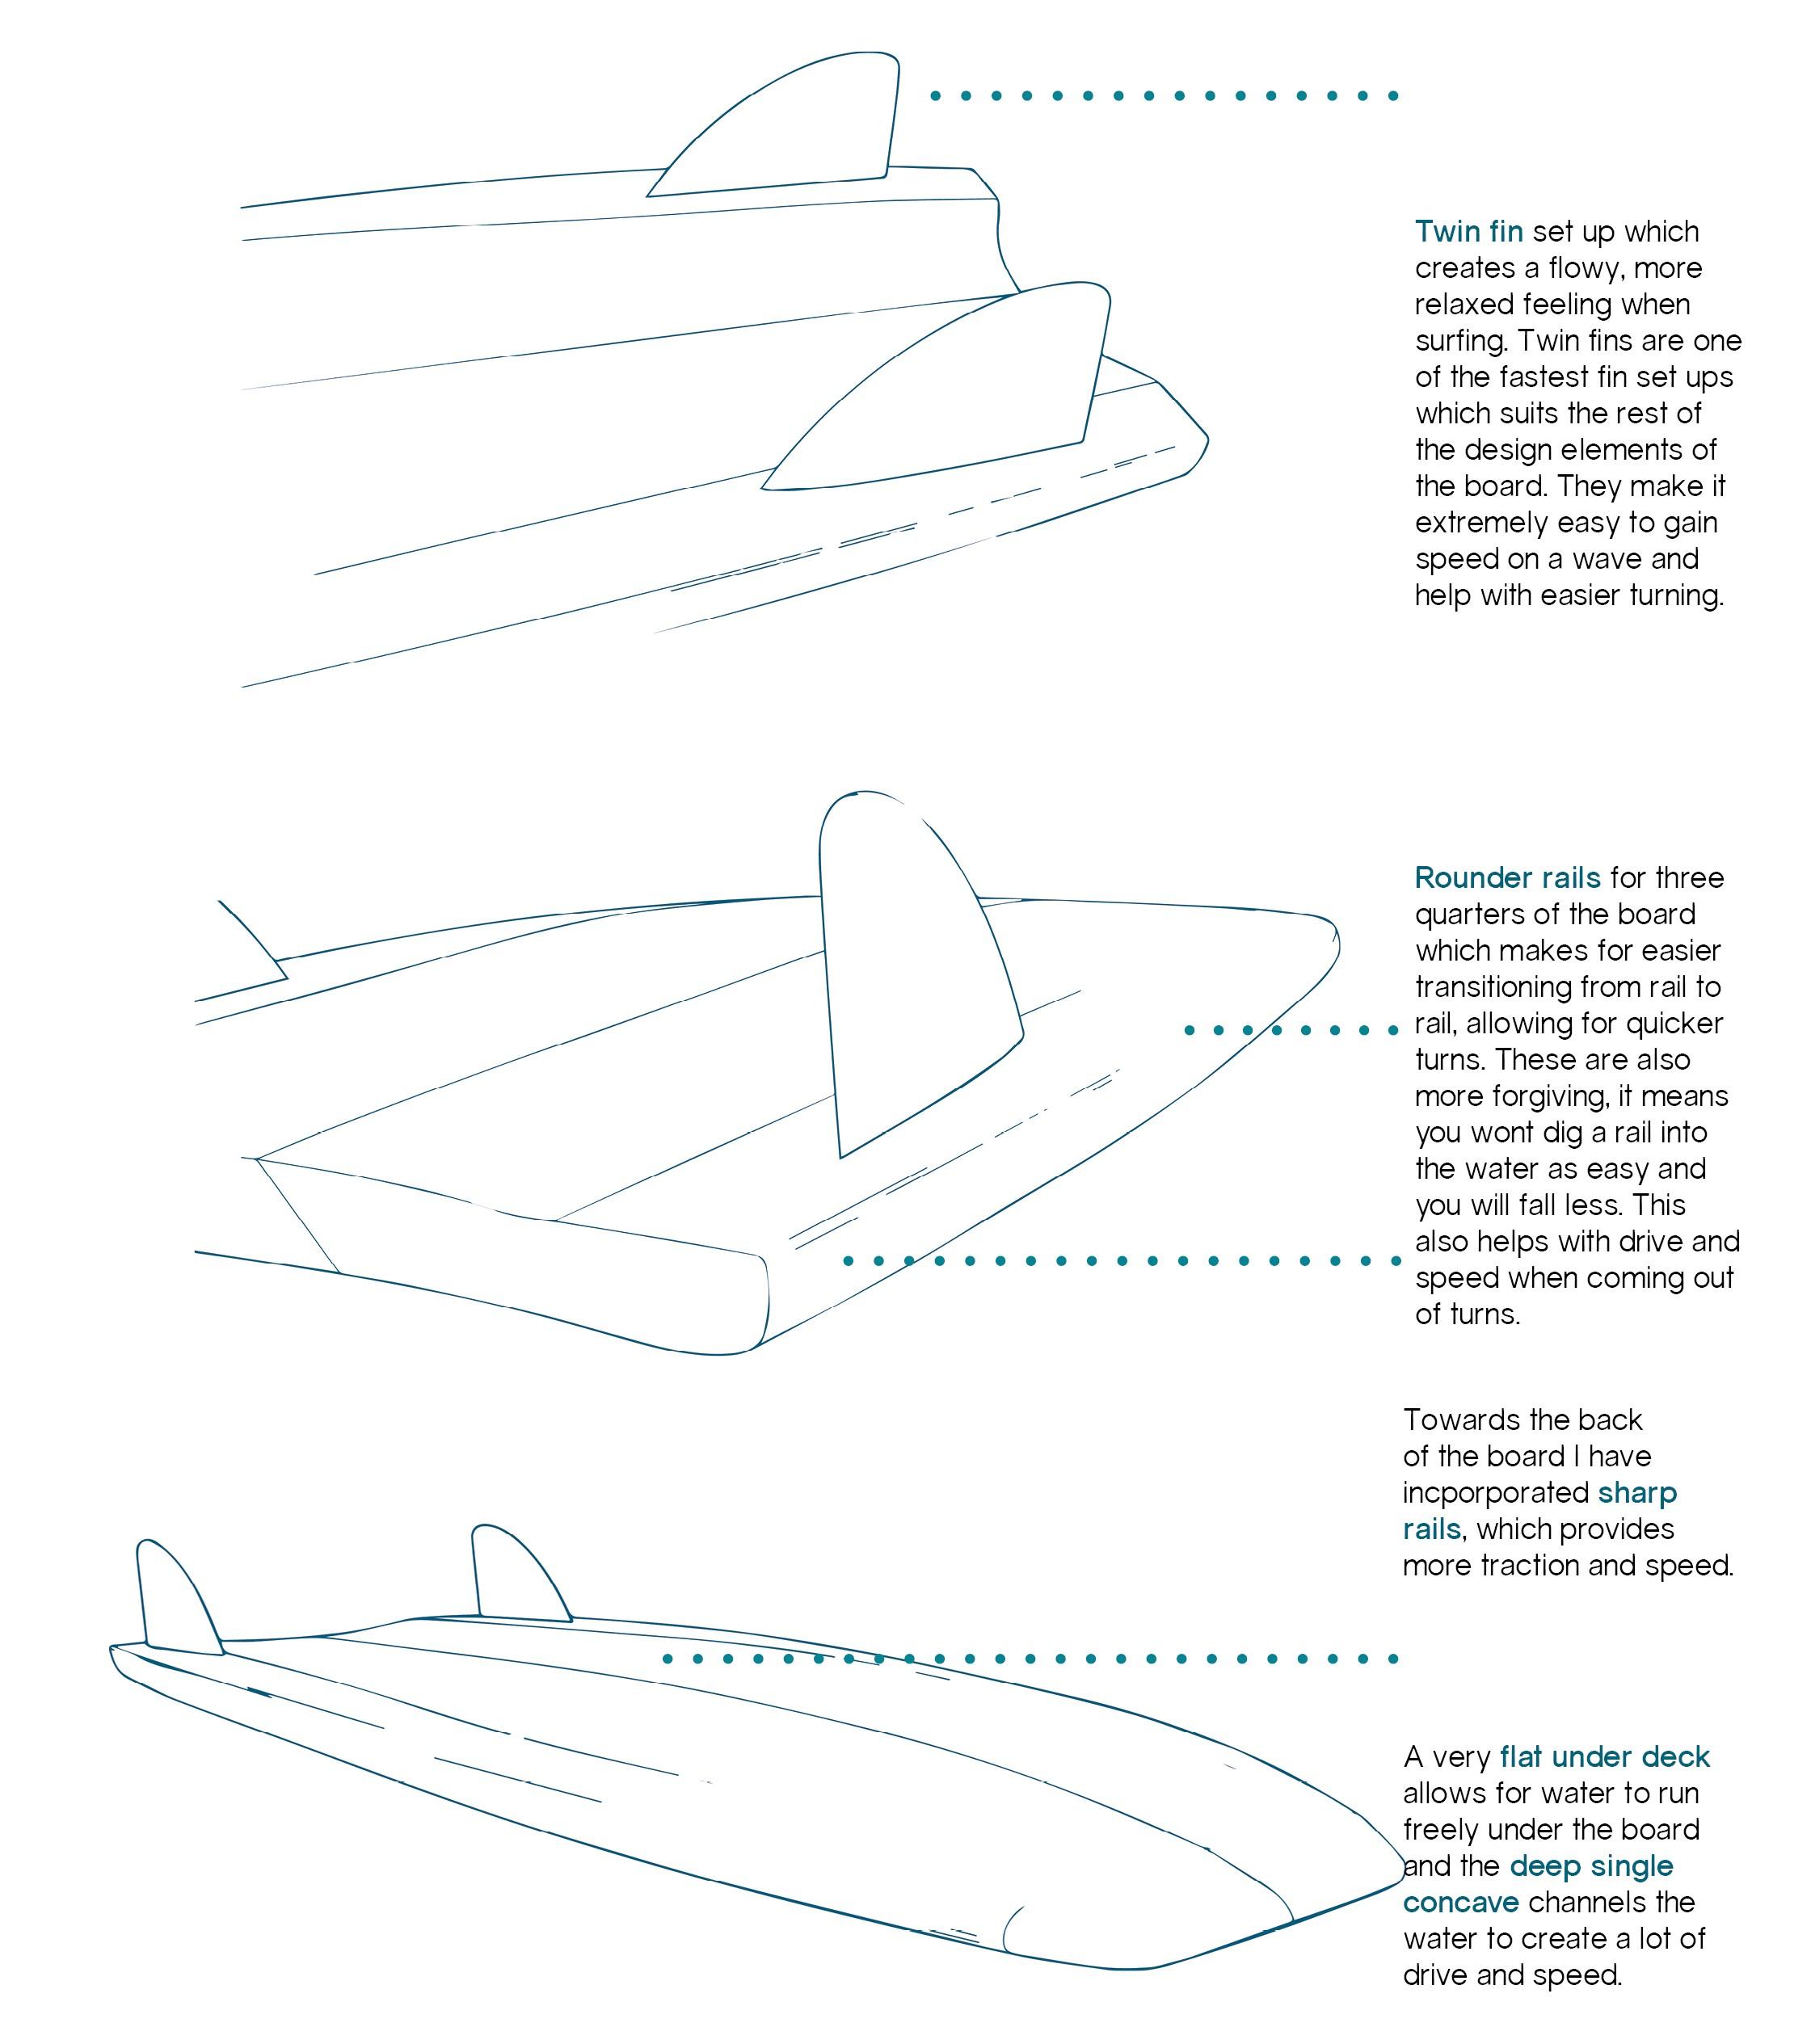 022 Surfboard Design 2.jpg